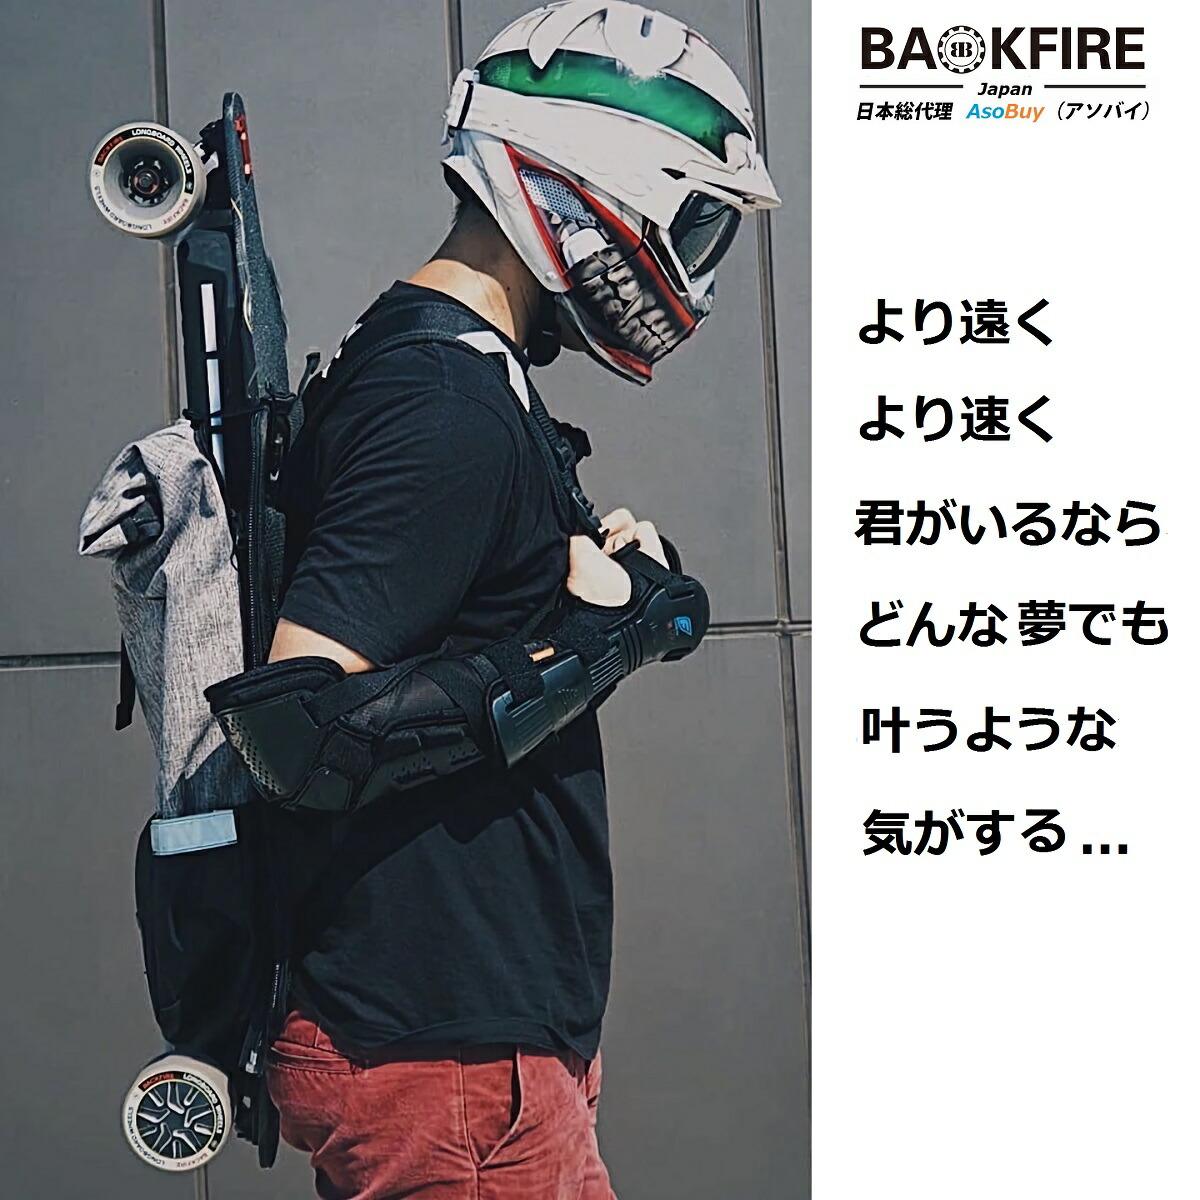 https://image.rakuten.co.jp/asobuy-shop/cabinet/07211238/backfire-g3-plus/backfire-g3-plus_011.jpg